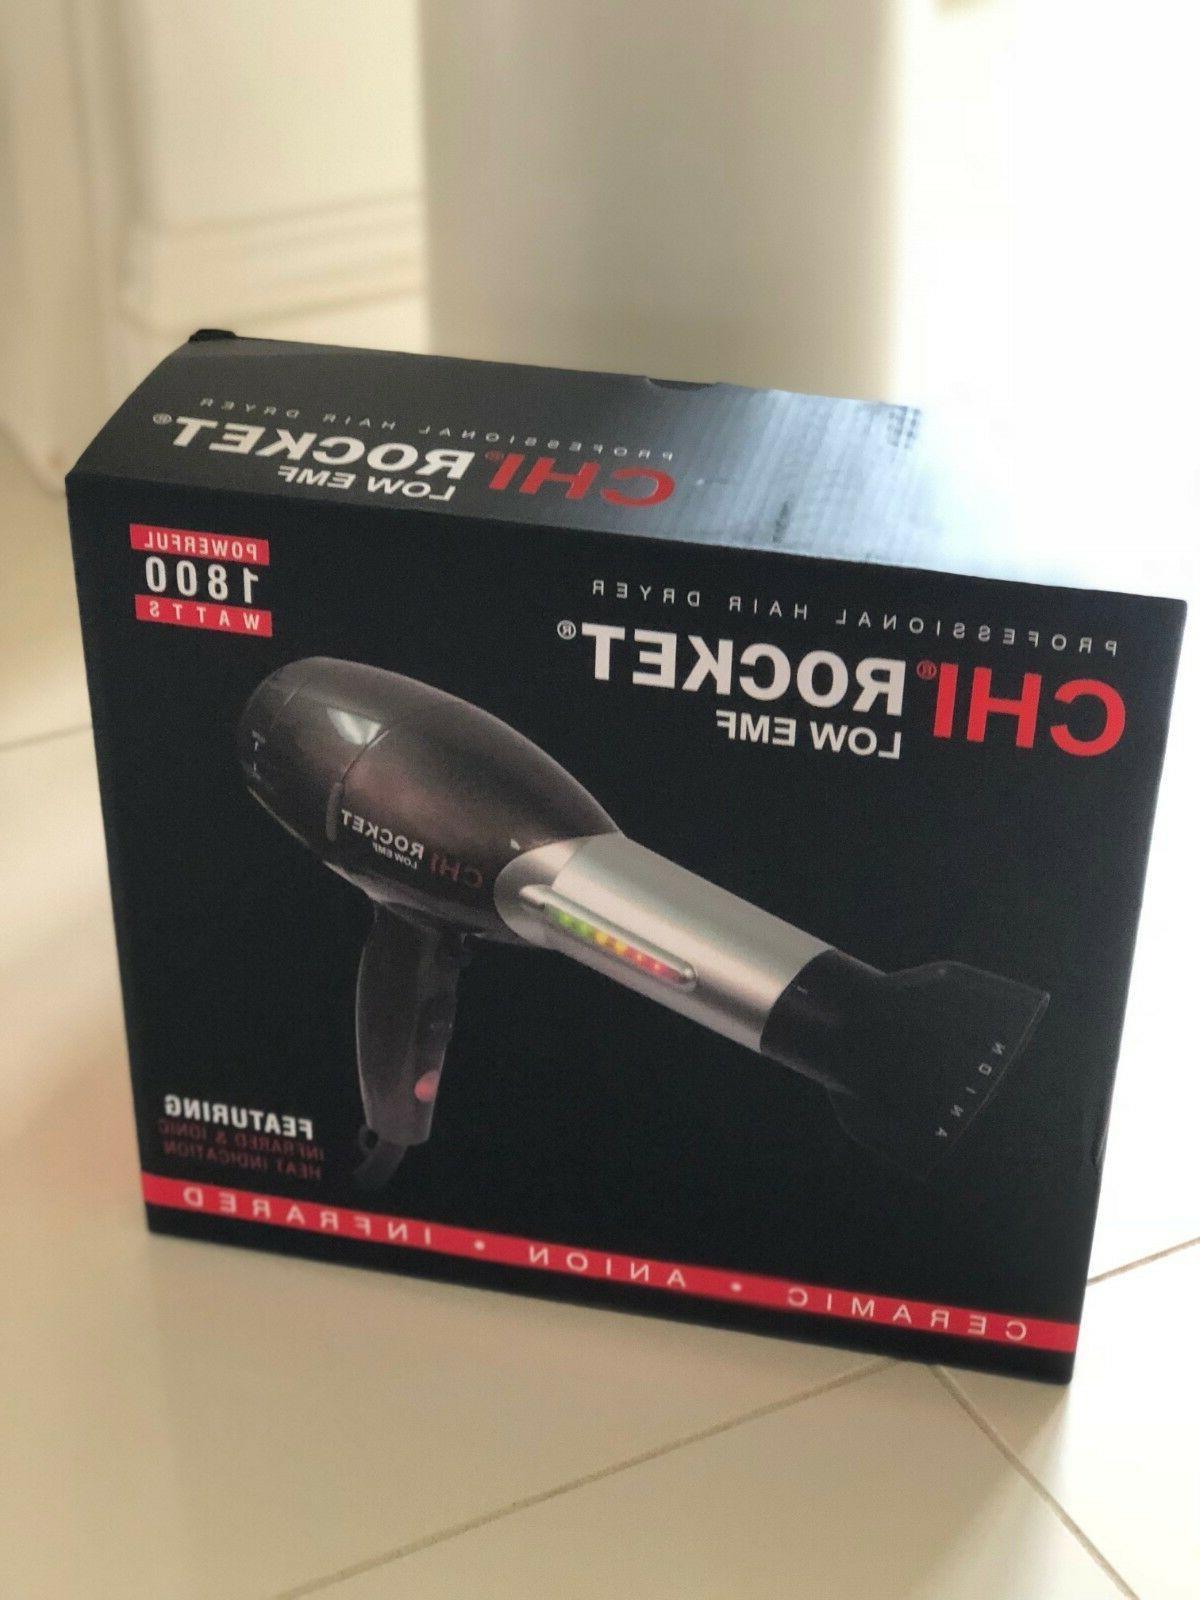 nib rocket low emf professional hair dryer